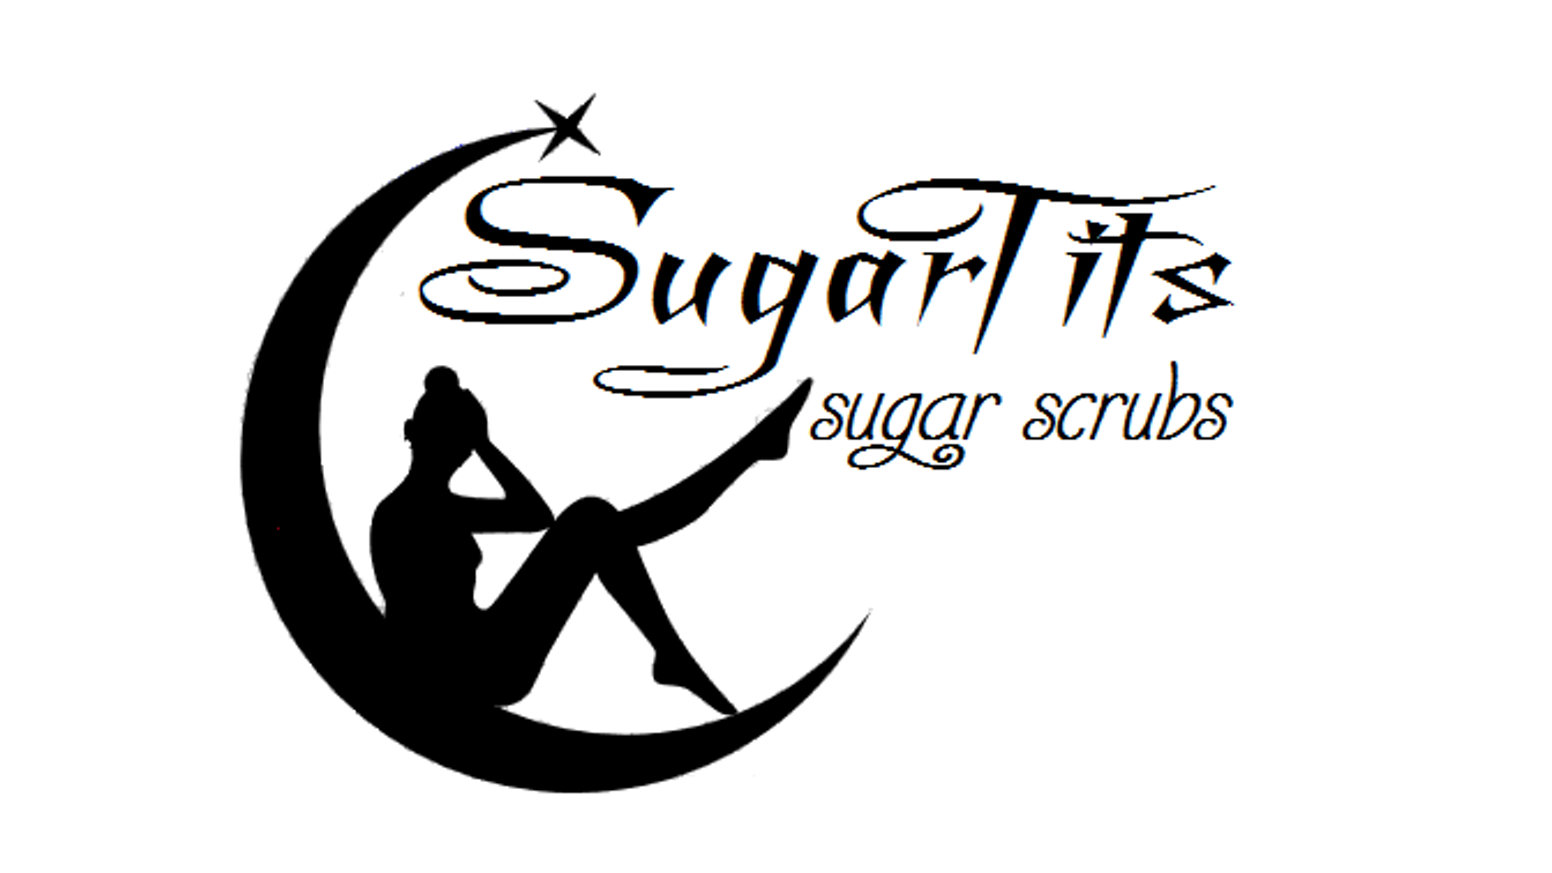 Sugar Tits Sugar Scrubs by Devon McIntosh —Kickstarter